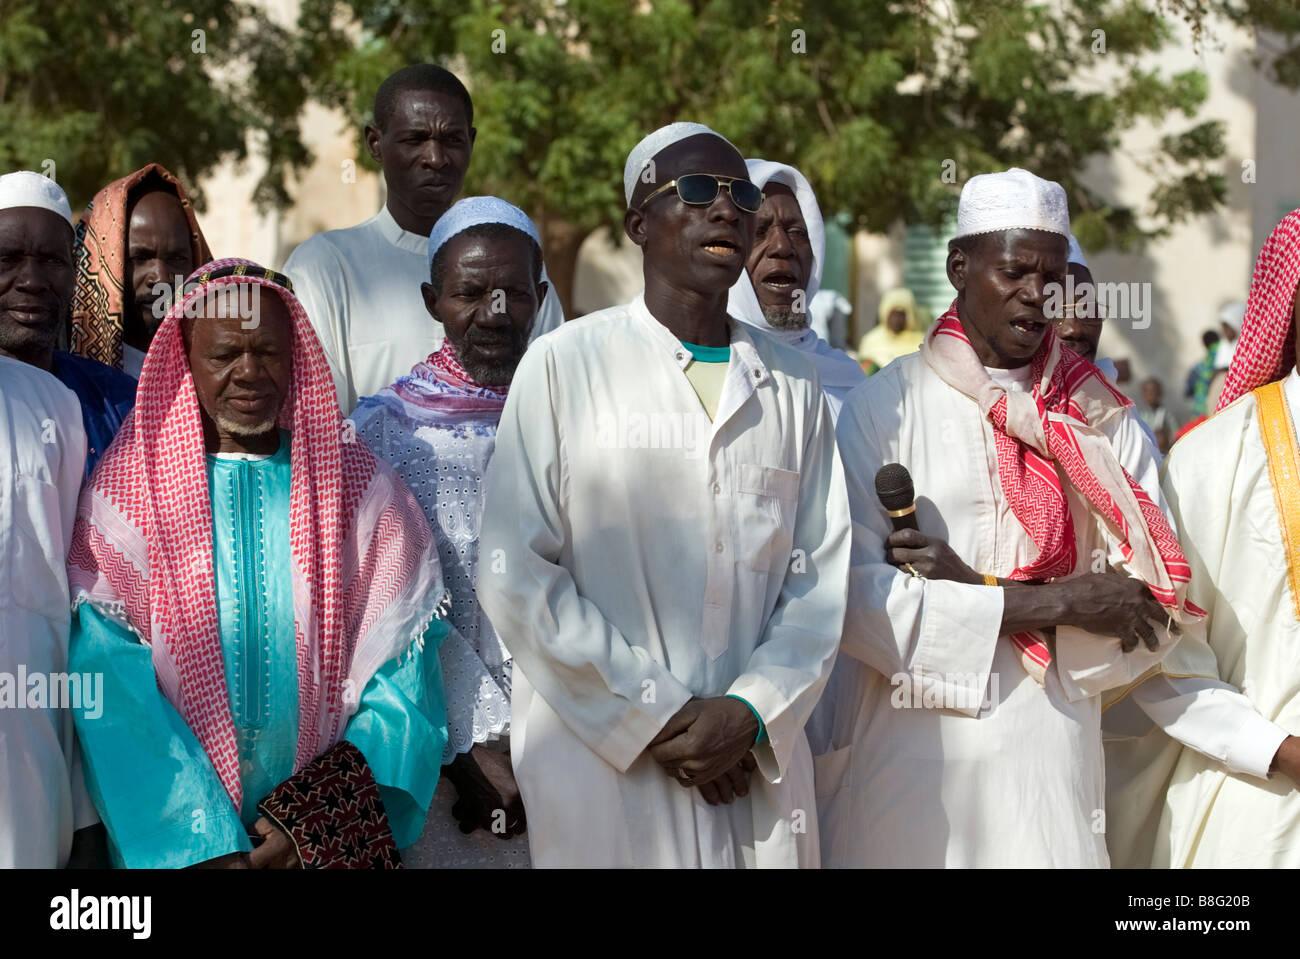 Muslim Africans in a Friday pray Ouagadougou Burkina Faso - Stock Image